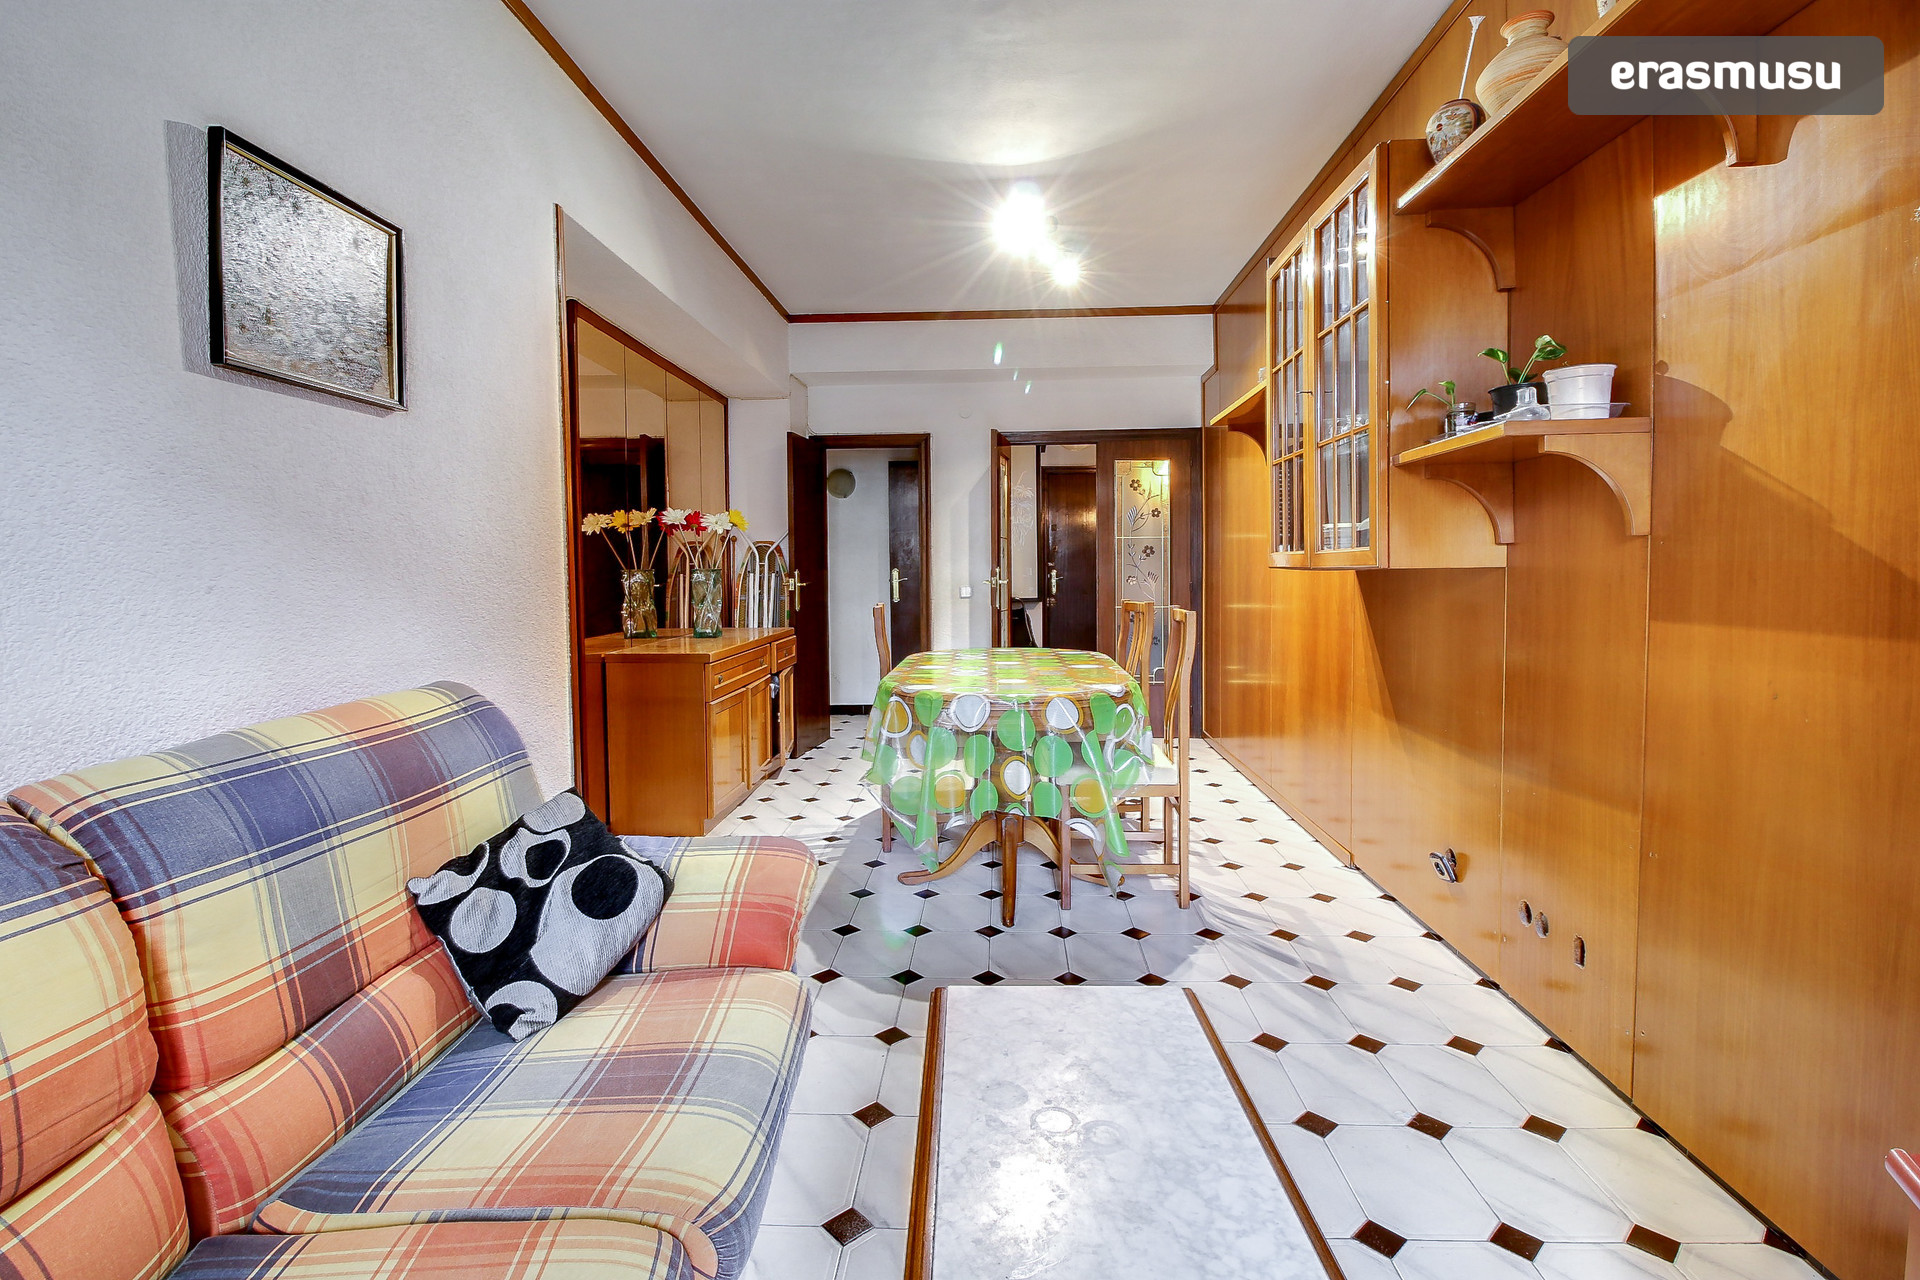 habitacion-chollo-barcelona-4ba9baf932b5